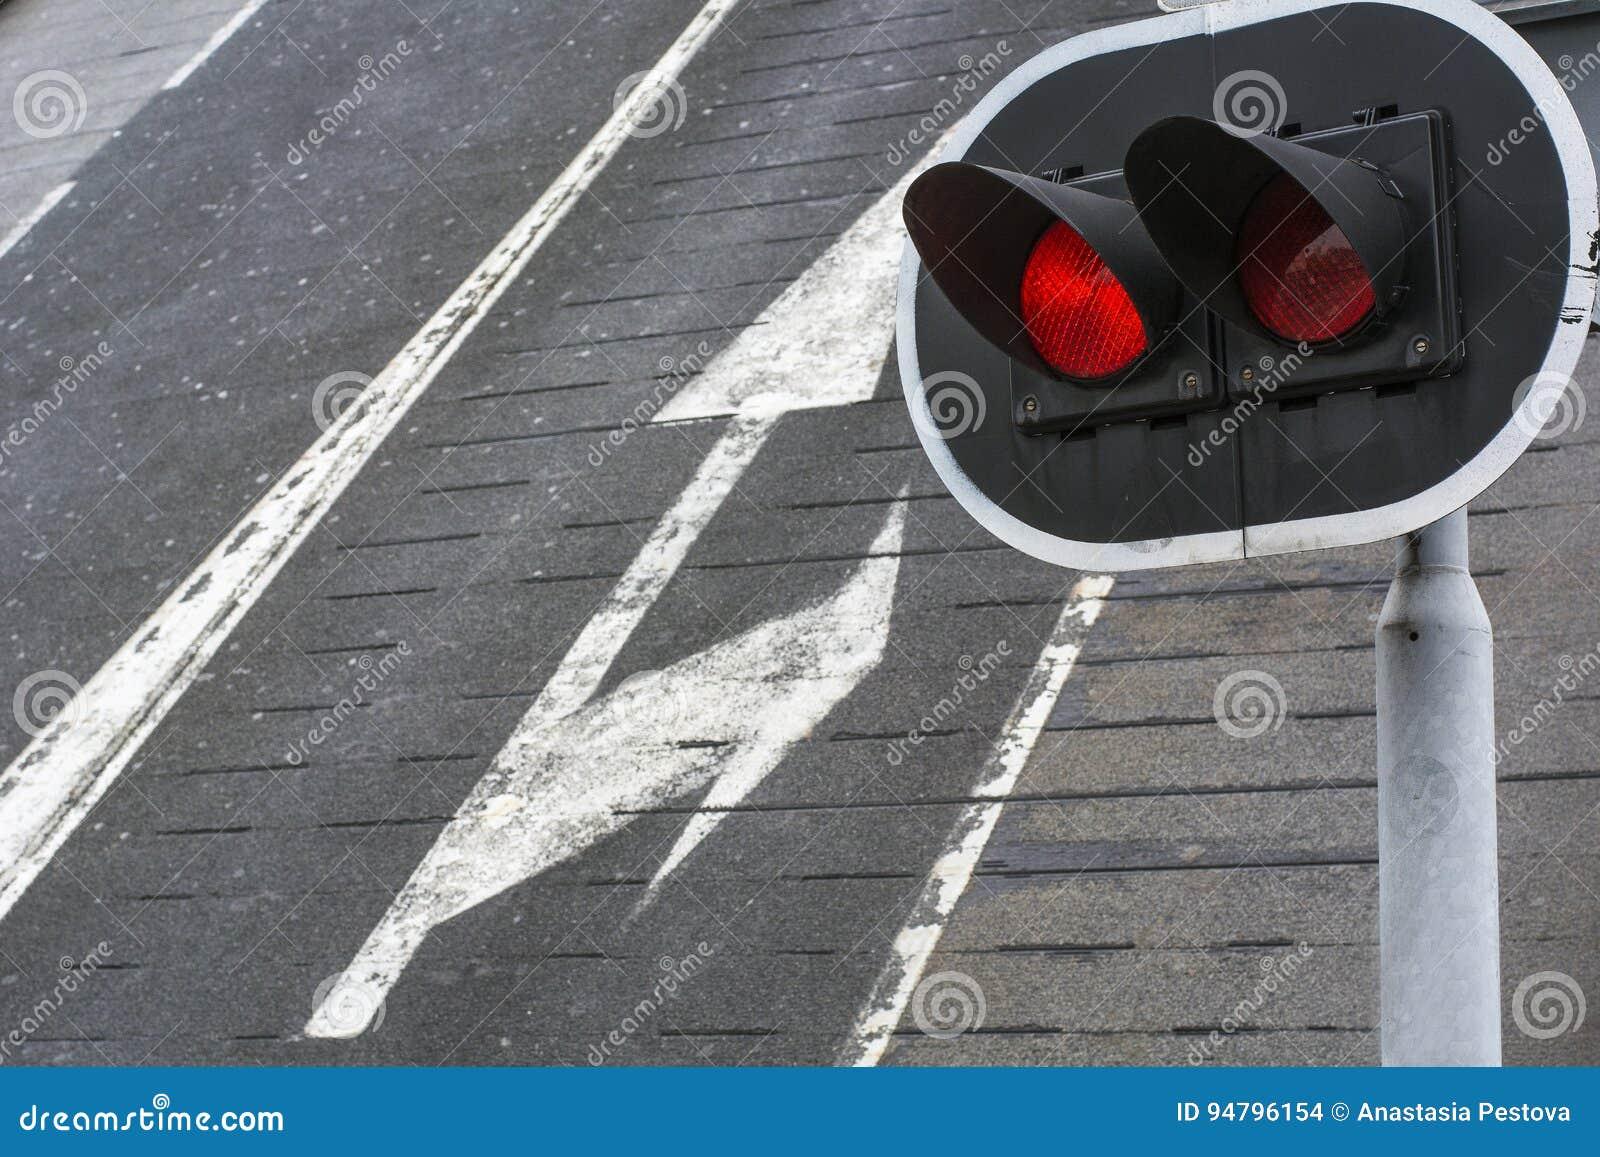 Plafoniere Rosse : Plafoniere rosse alte fotografia stock immagine